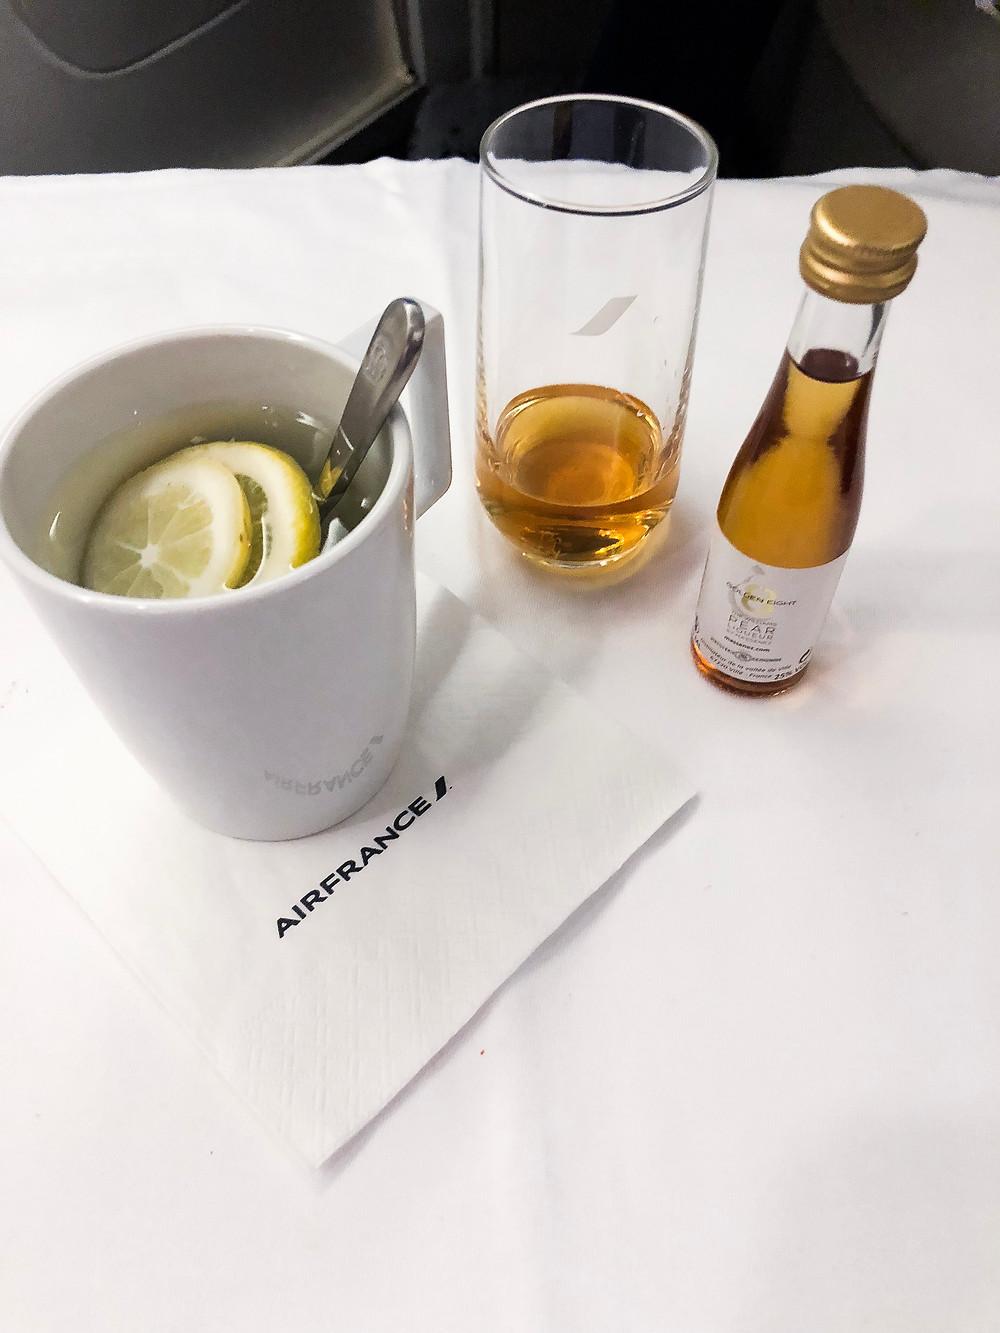 Air France Business Class, Pear Brandy